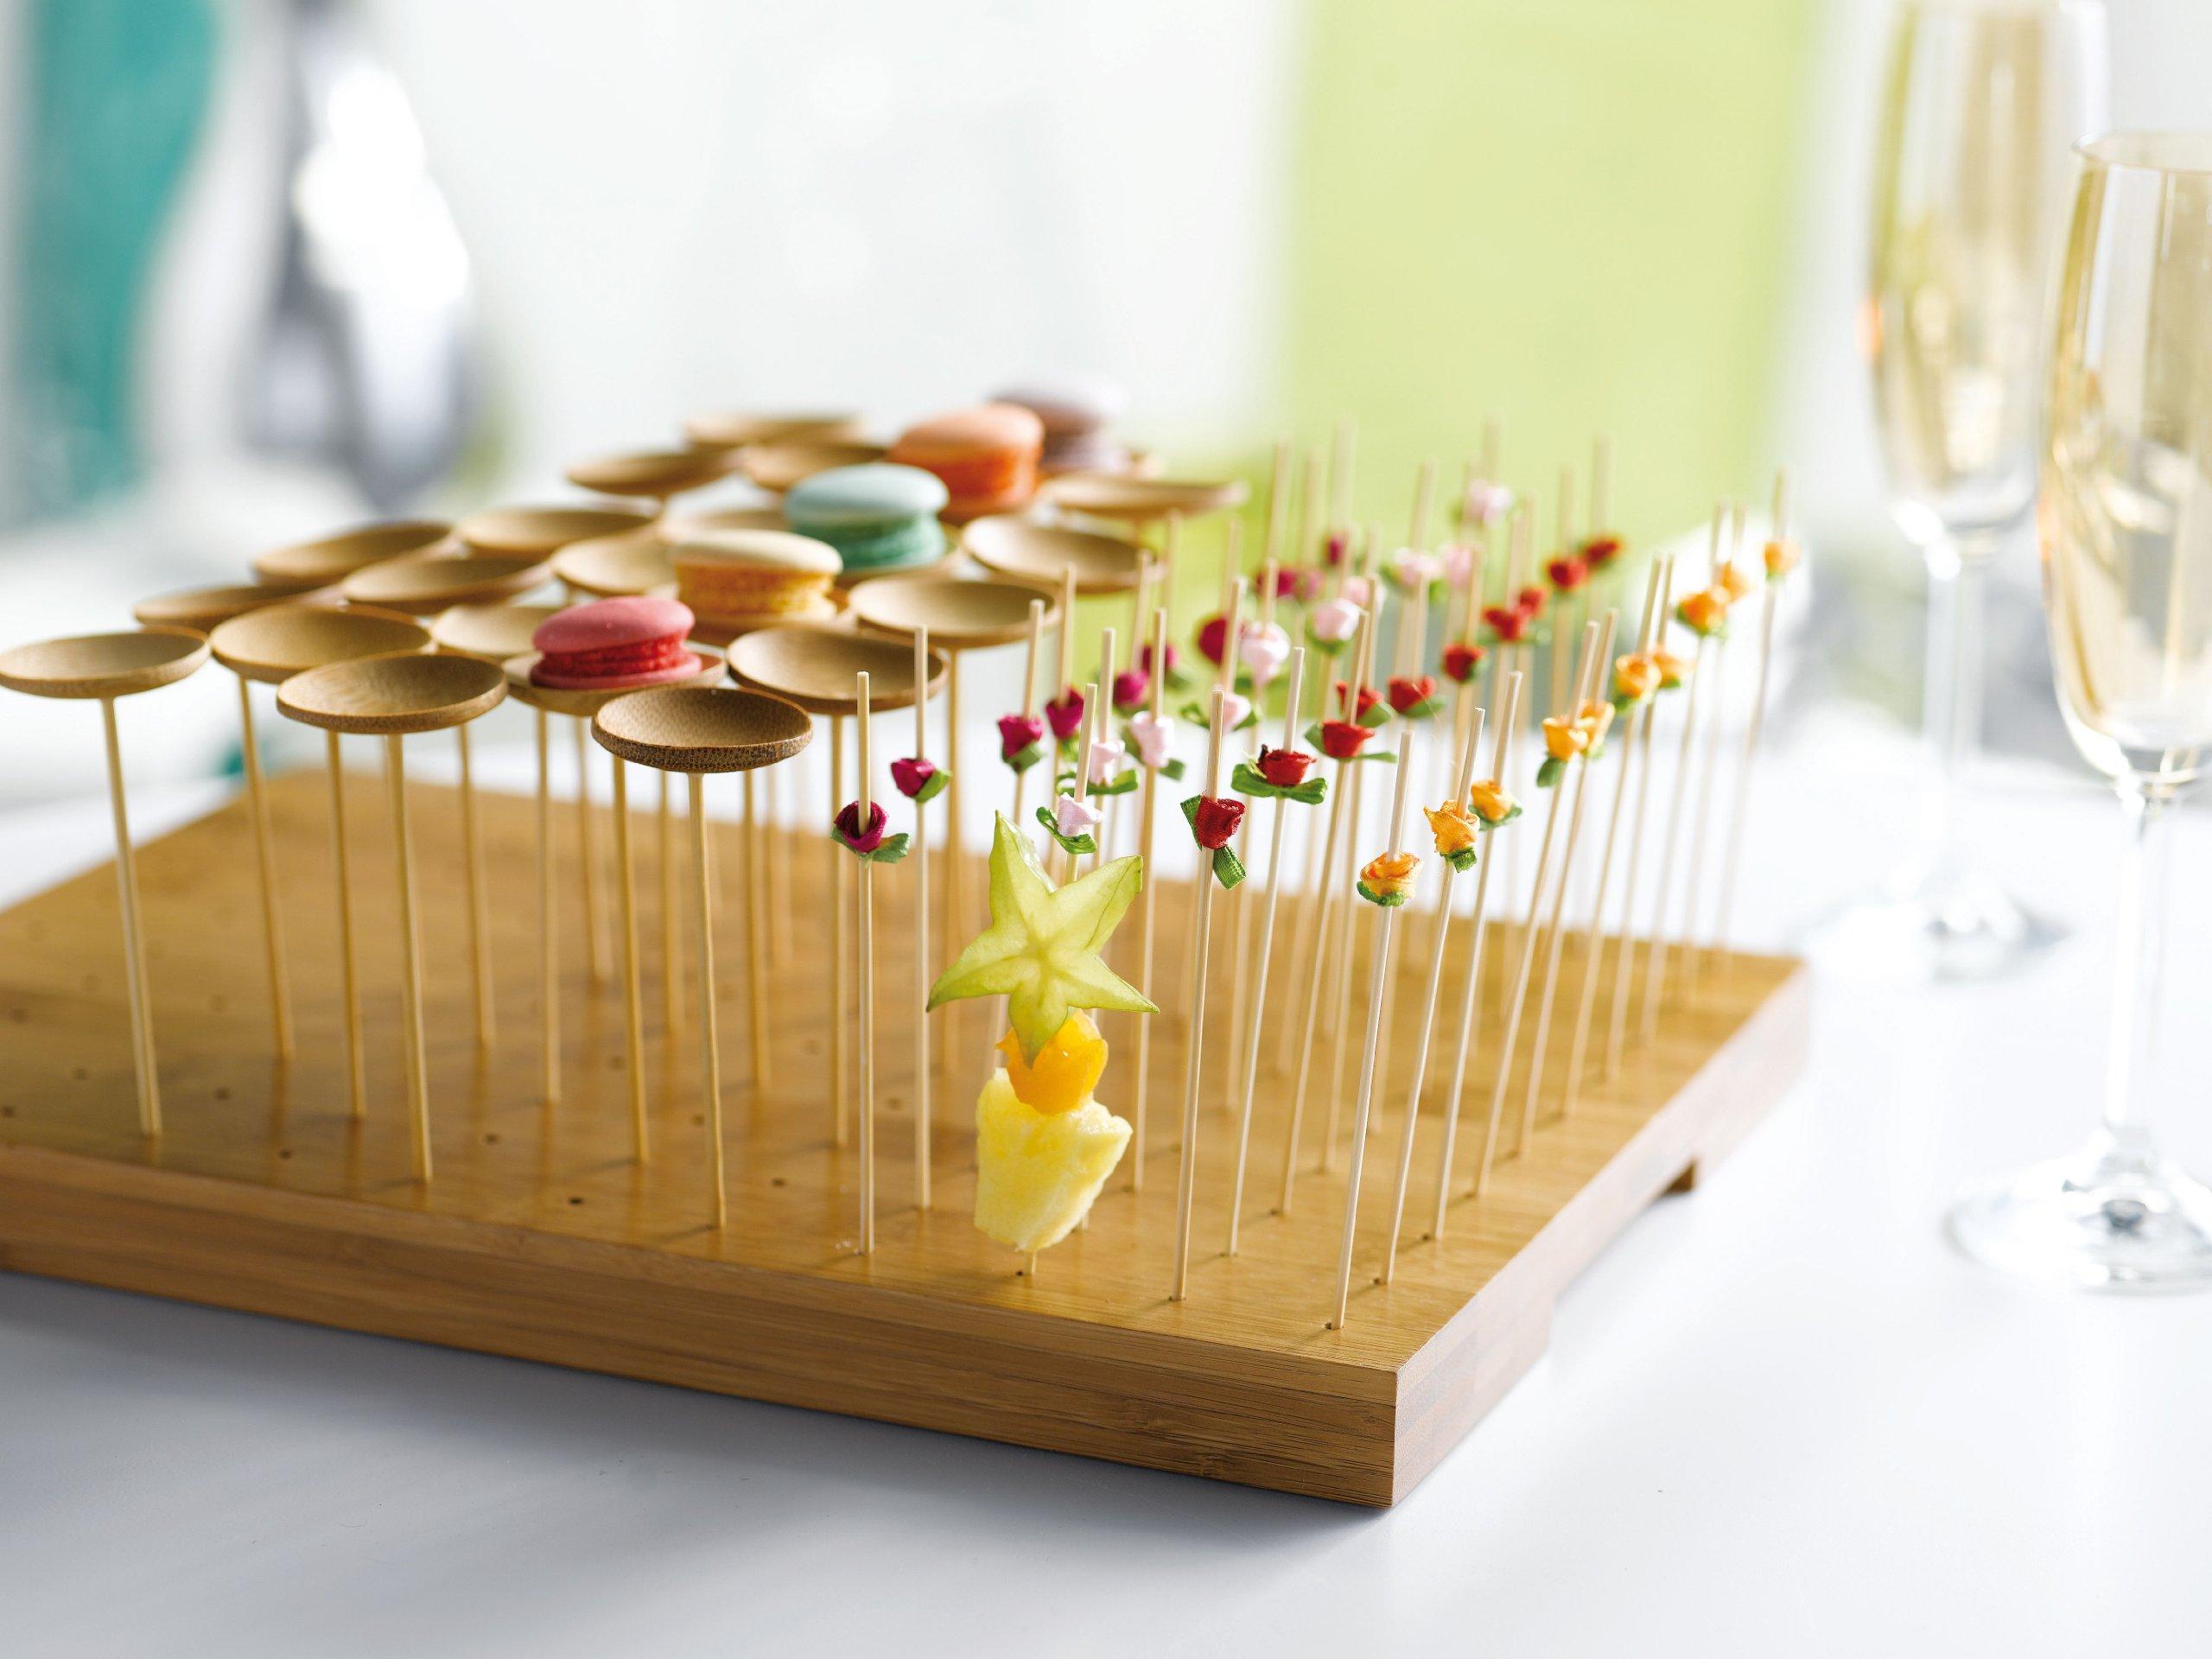 "PackNWood 209BBTHANI ""Thani'' Bamboo Mini Dish with Skewer - Length: 3.9'' Dish : 1.6'' - 144 per case by PacknWood"